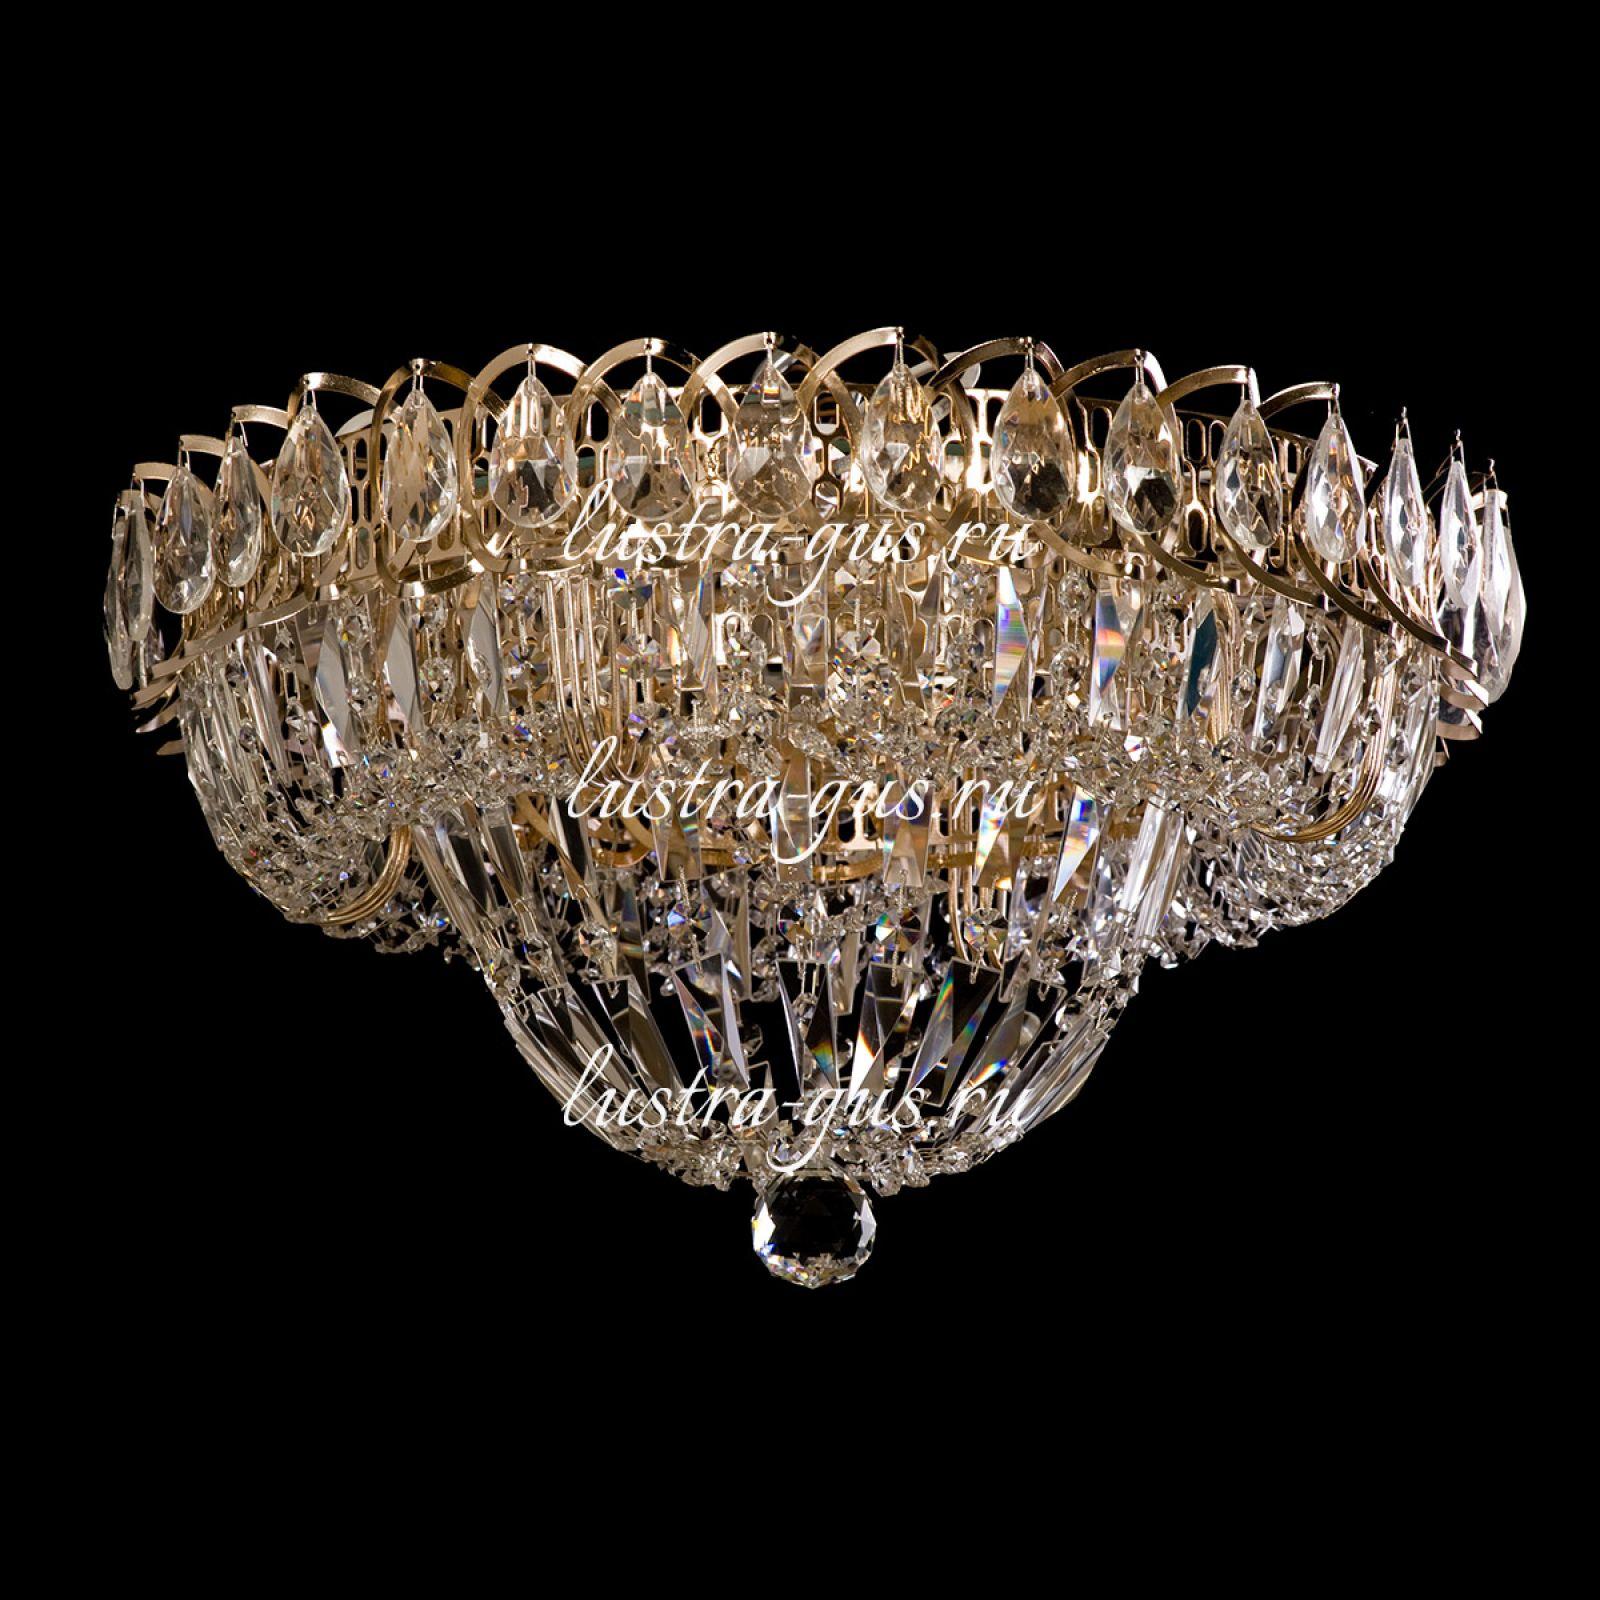 Люстра Кольцо Купол Пластинка 450 мм, золото